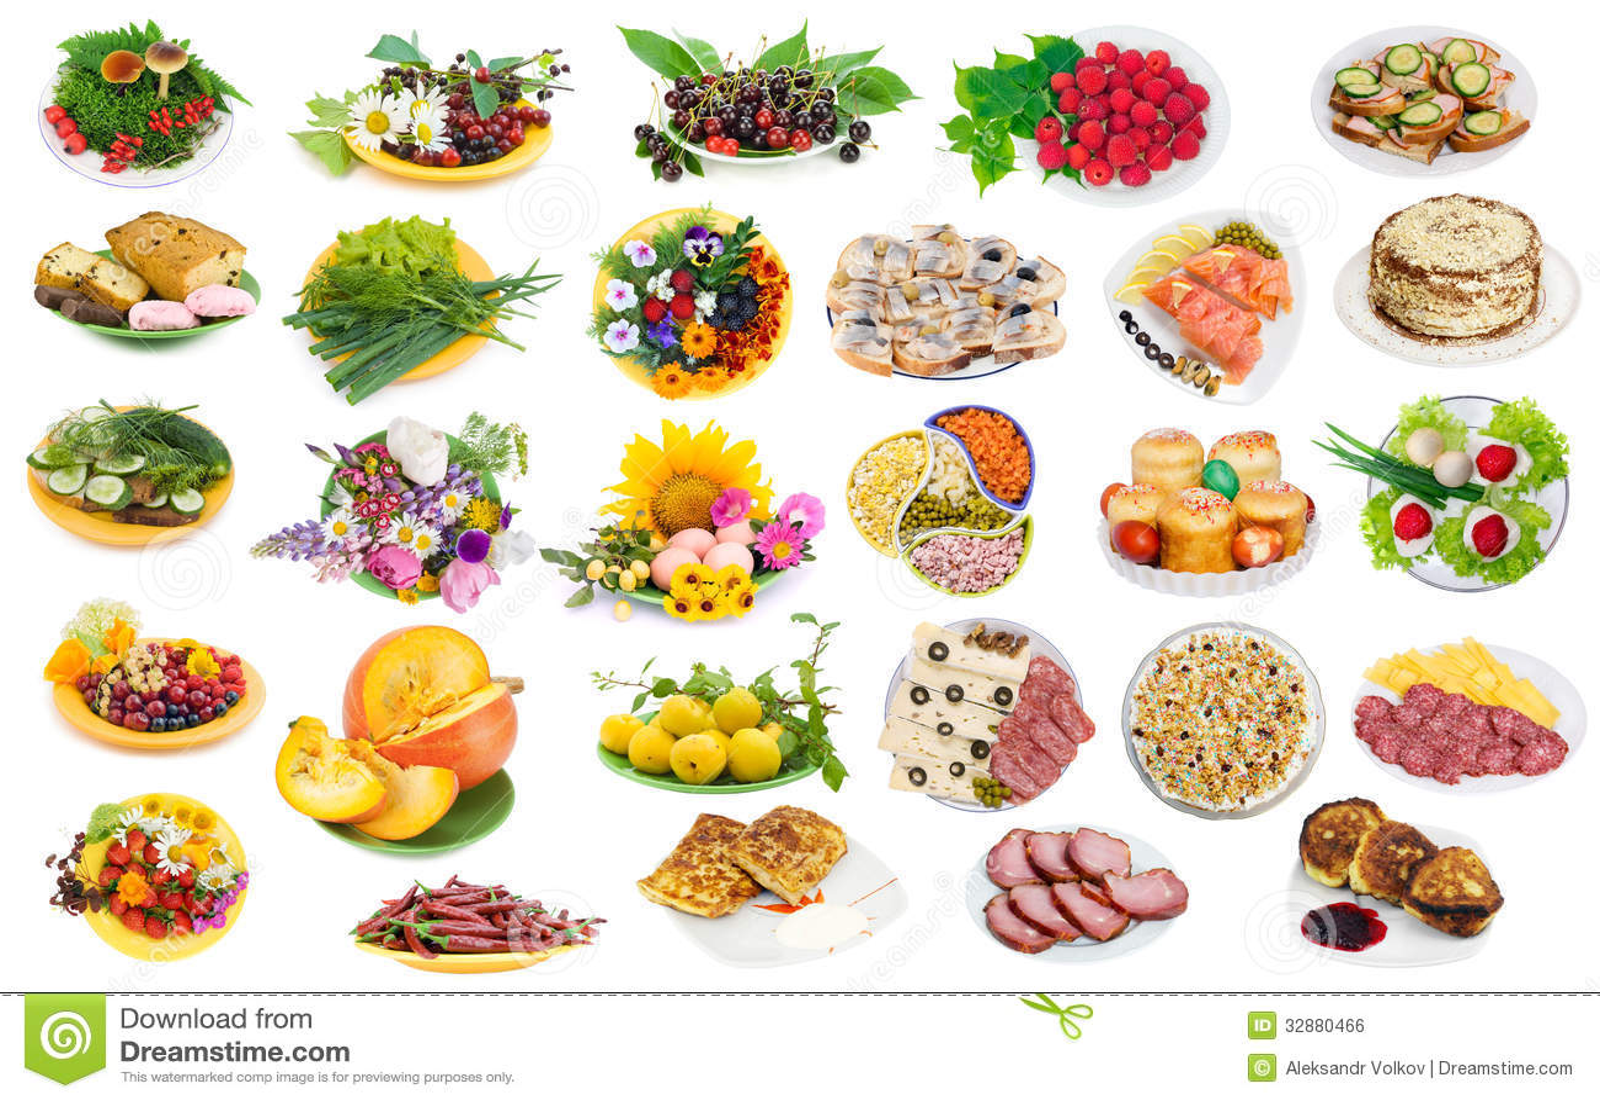 Еда на установленных плитах